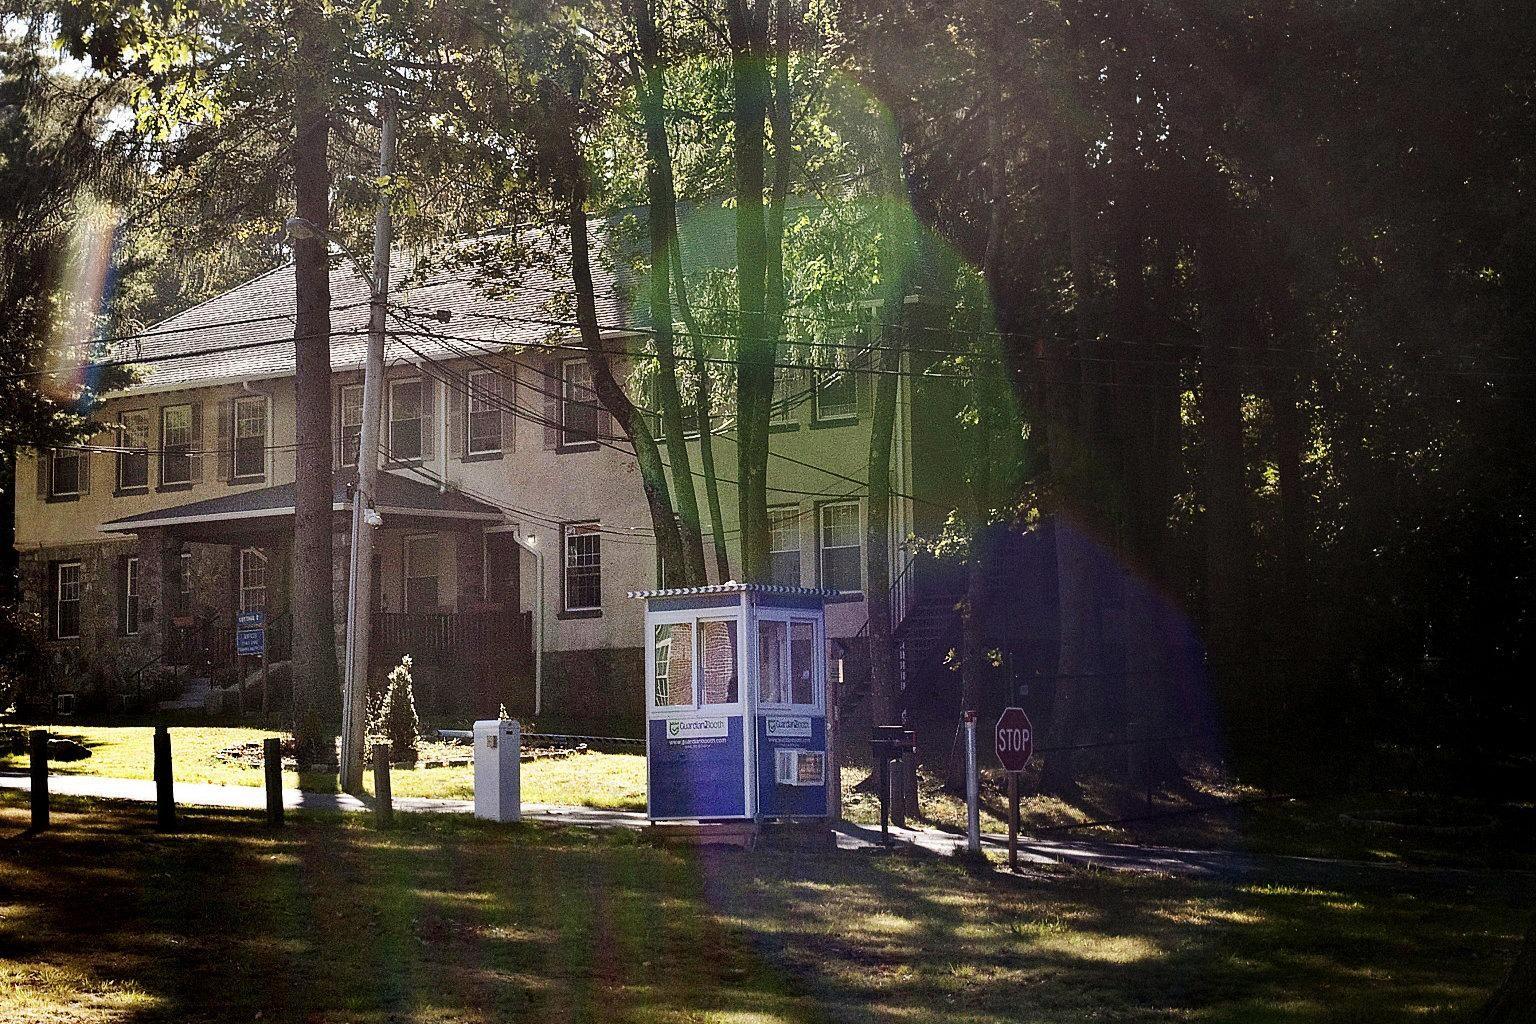 guard shack protects premises